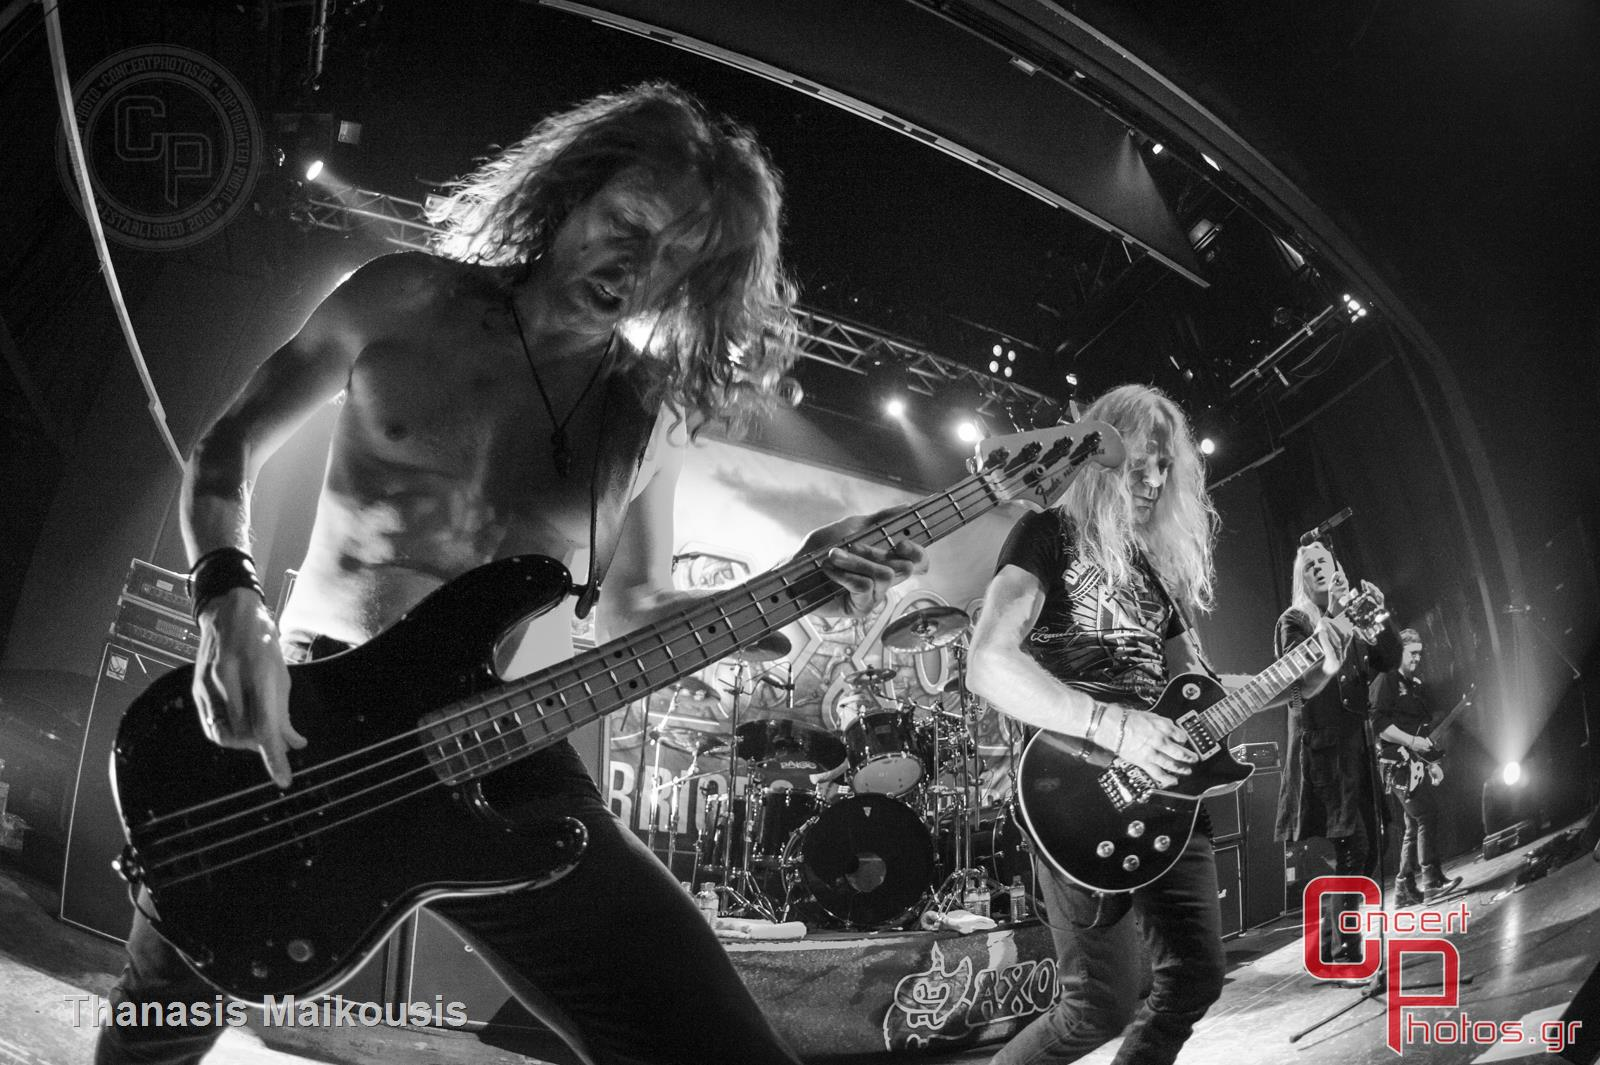 Saxon & Innerwish -Saxon Innerwish Gagarin photographer: Thanasis Maikousis - concertphotos_20141025_22_30_51